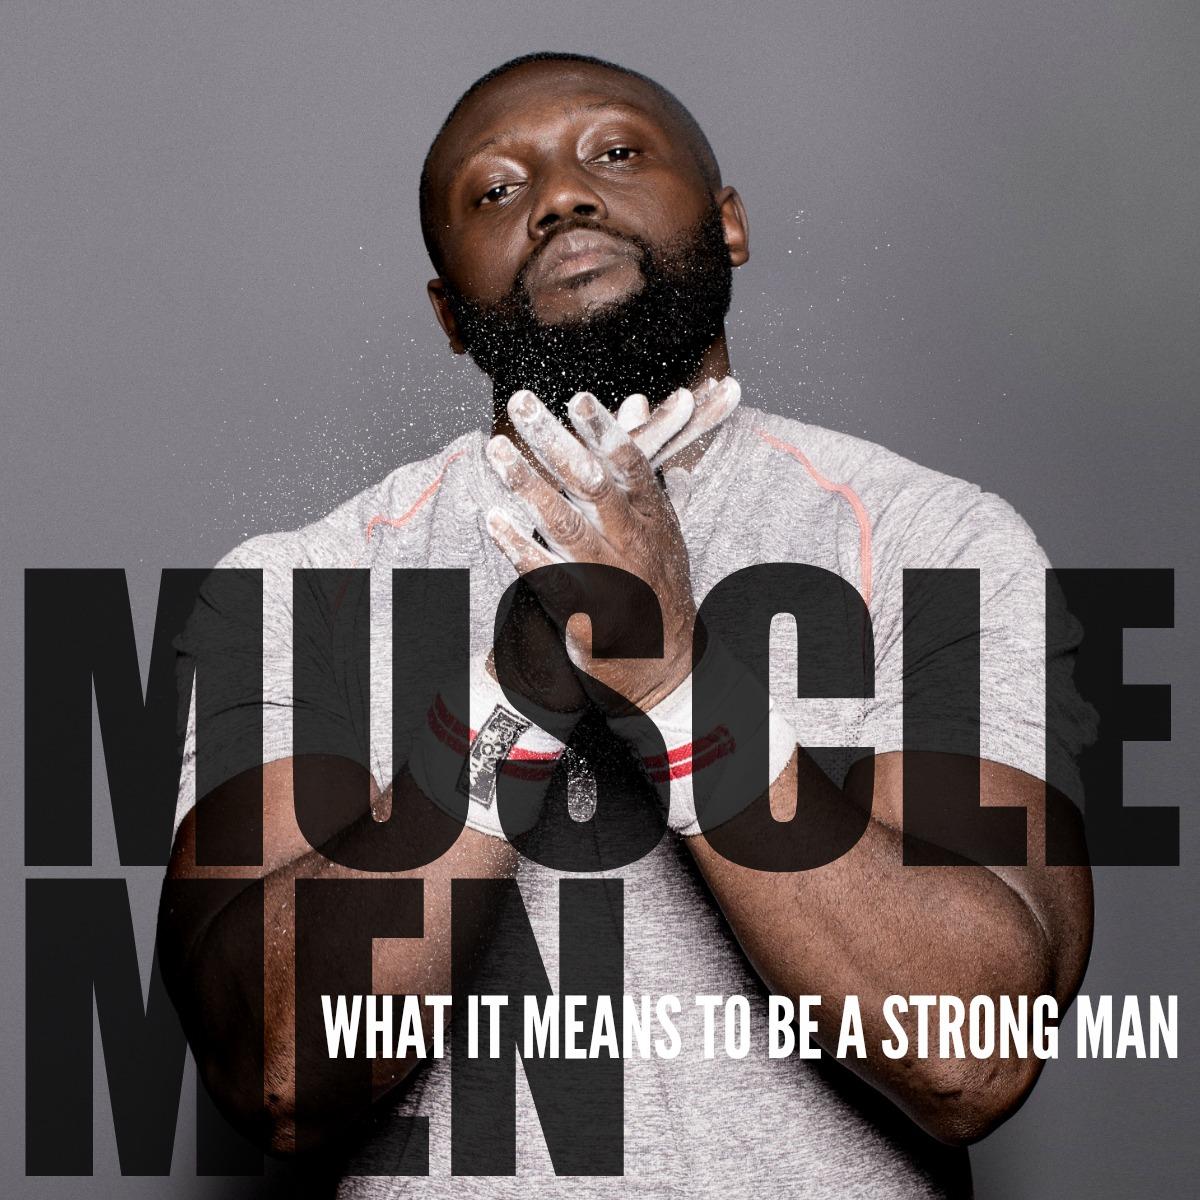 Muscle Men: Week 2